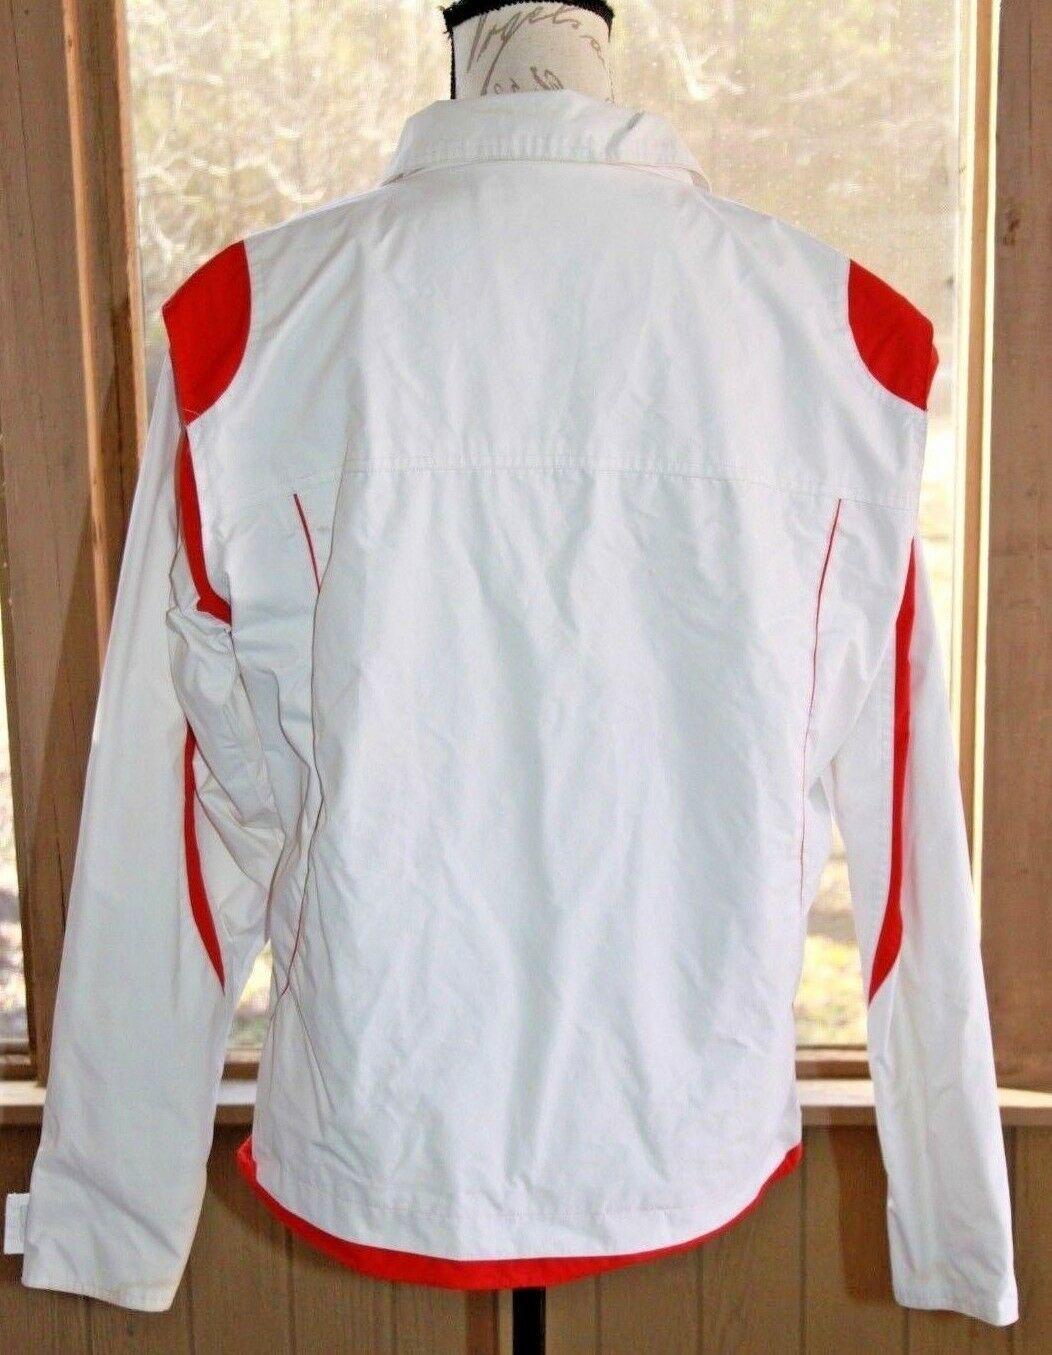 Rossignol Size XL Gore Tex White & Red Jacket Snowboard SKI Snow Women's (BA) image 3